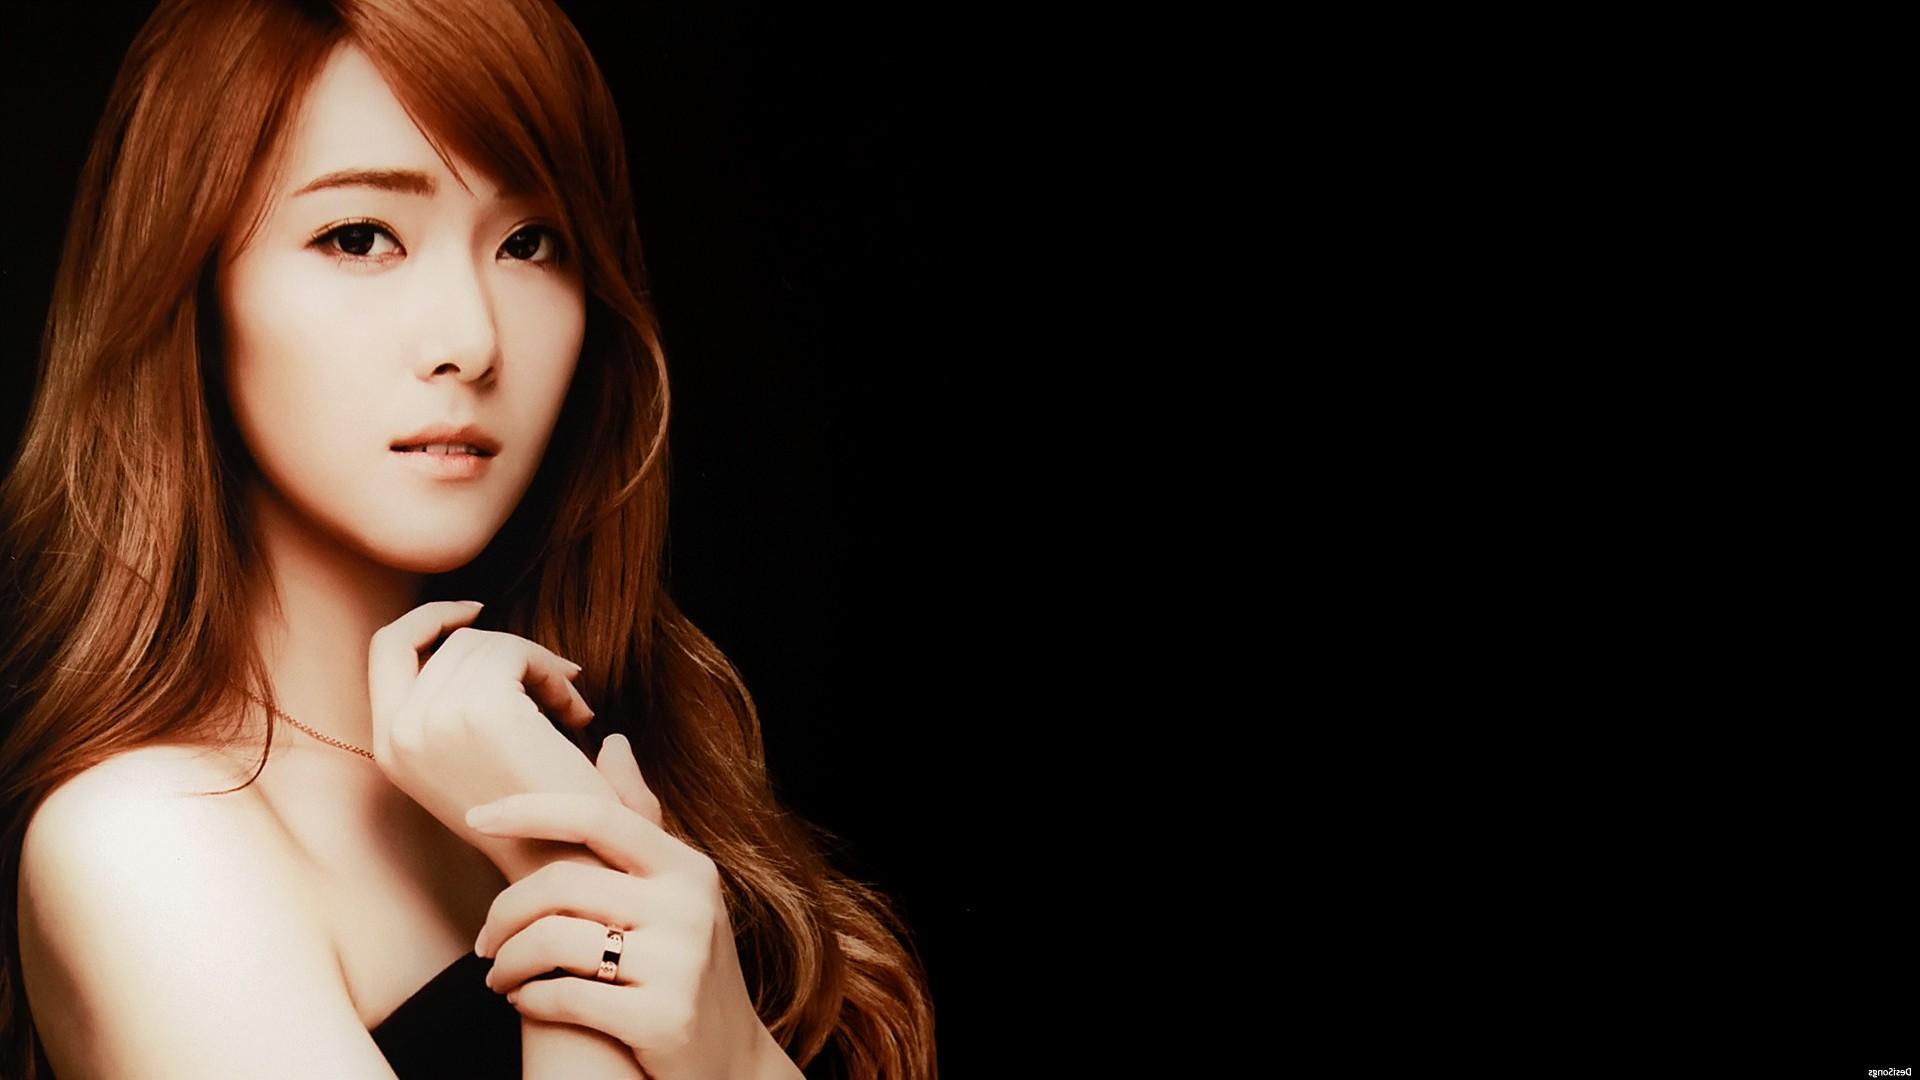 Wallpaper Face Women Long Hair Asian Singer Black Hair